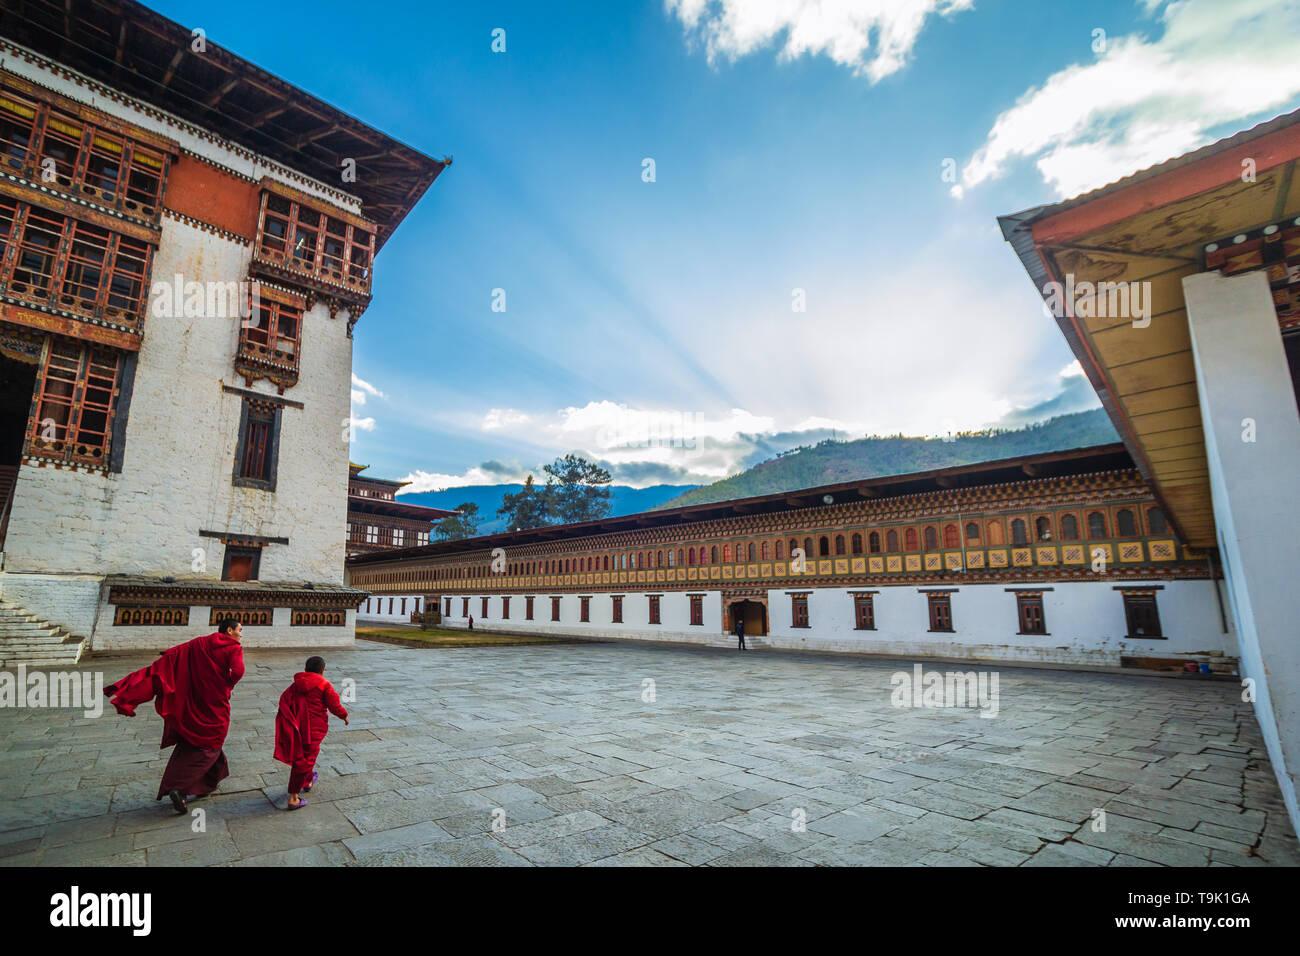 Thimphu, Bhutan: January 5th, 2017 - Stock Image